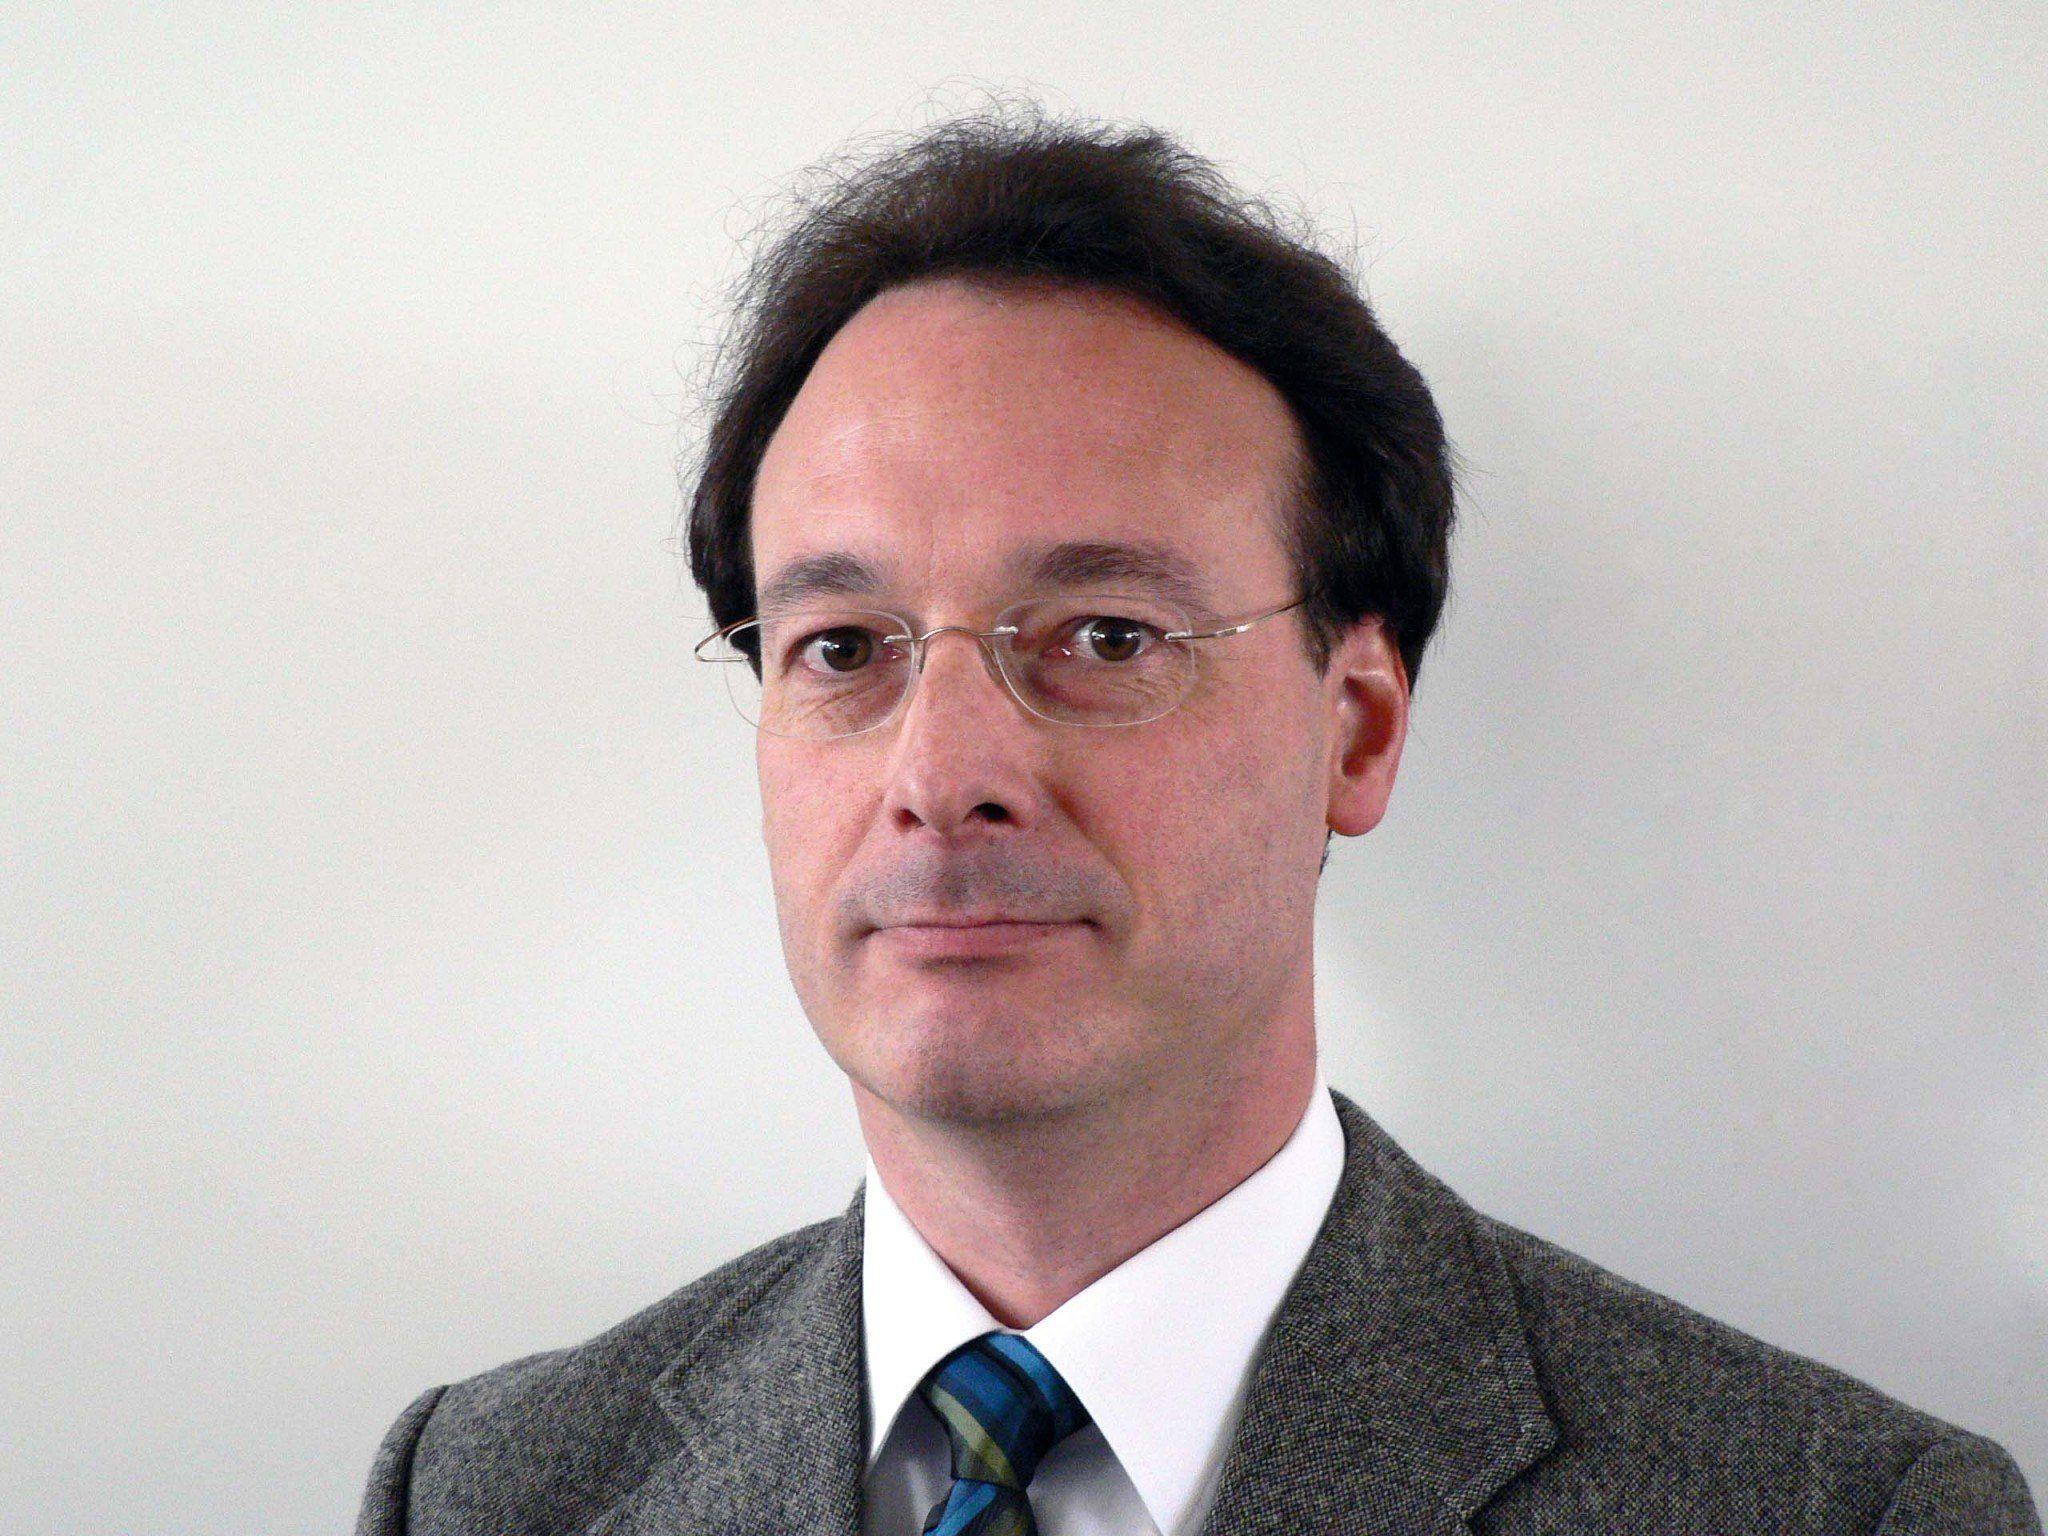 Prof. (FH) Dr. Franz Geiger zum Studiengangsleiter Elektrotechnik Dual der FH Vorarlberg bestellt.